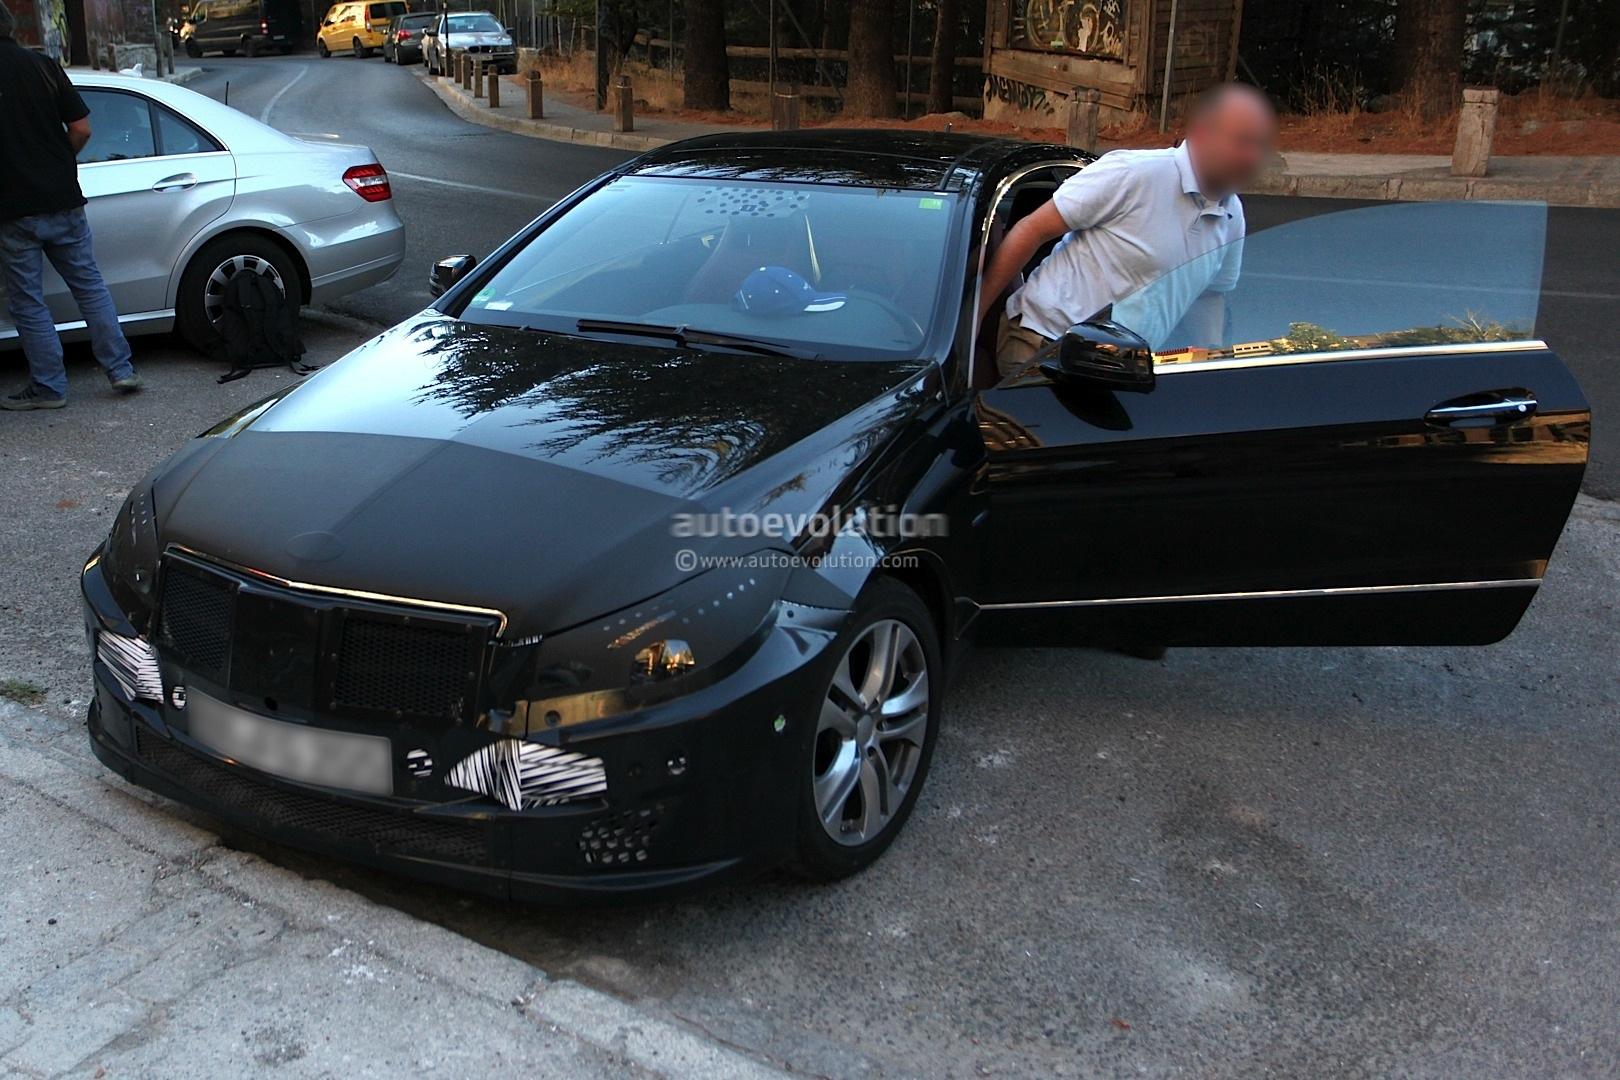 spyshots 2014 mercedes e class coupe facelift with less camo autoevolution. Black Bedroom Furniture Sets. Home Design Ideas